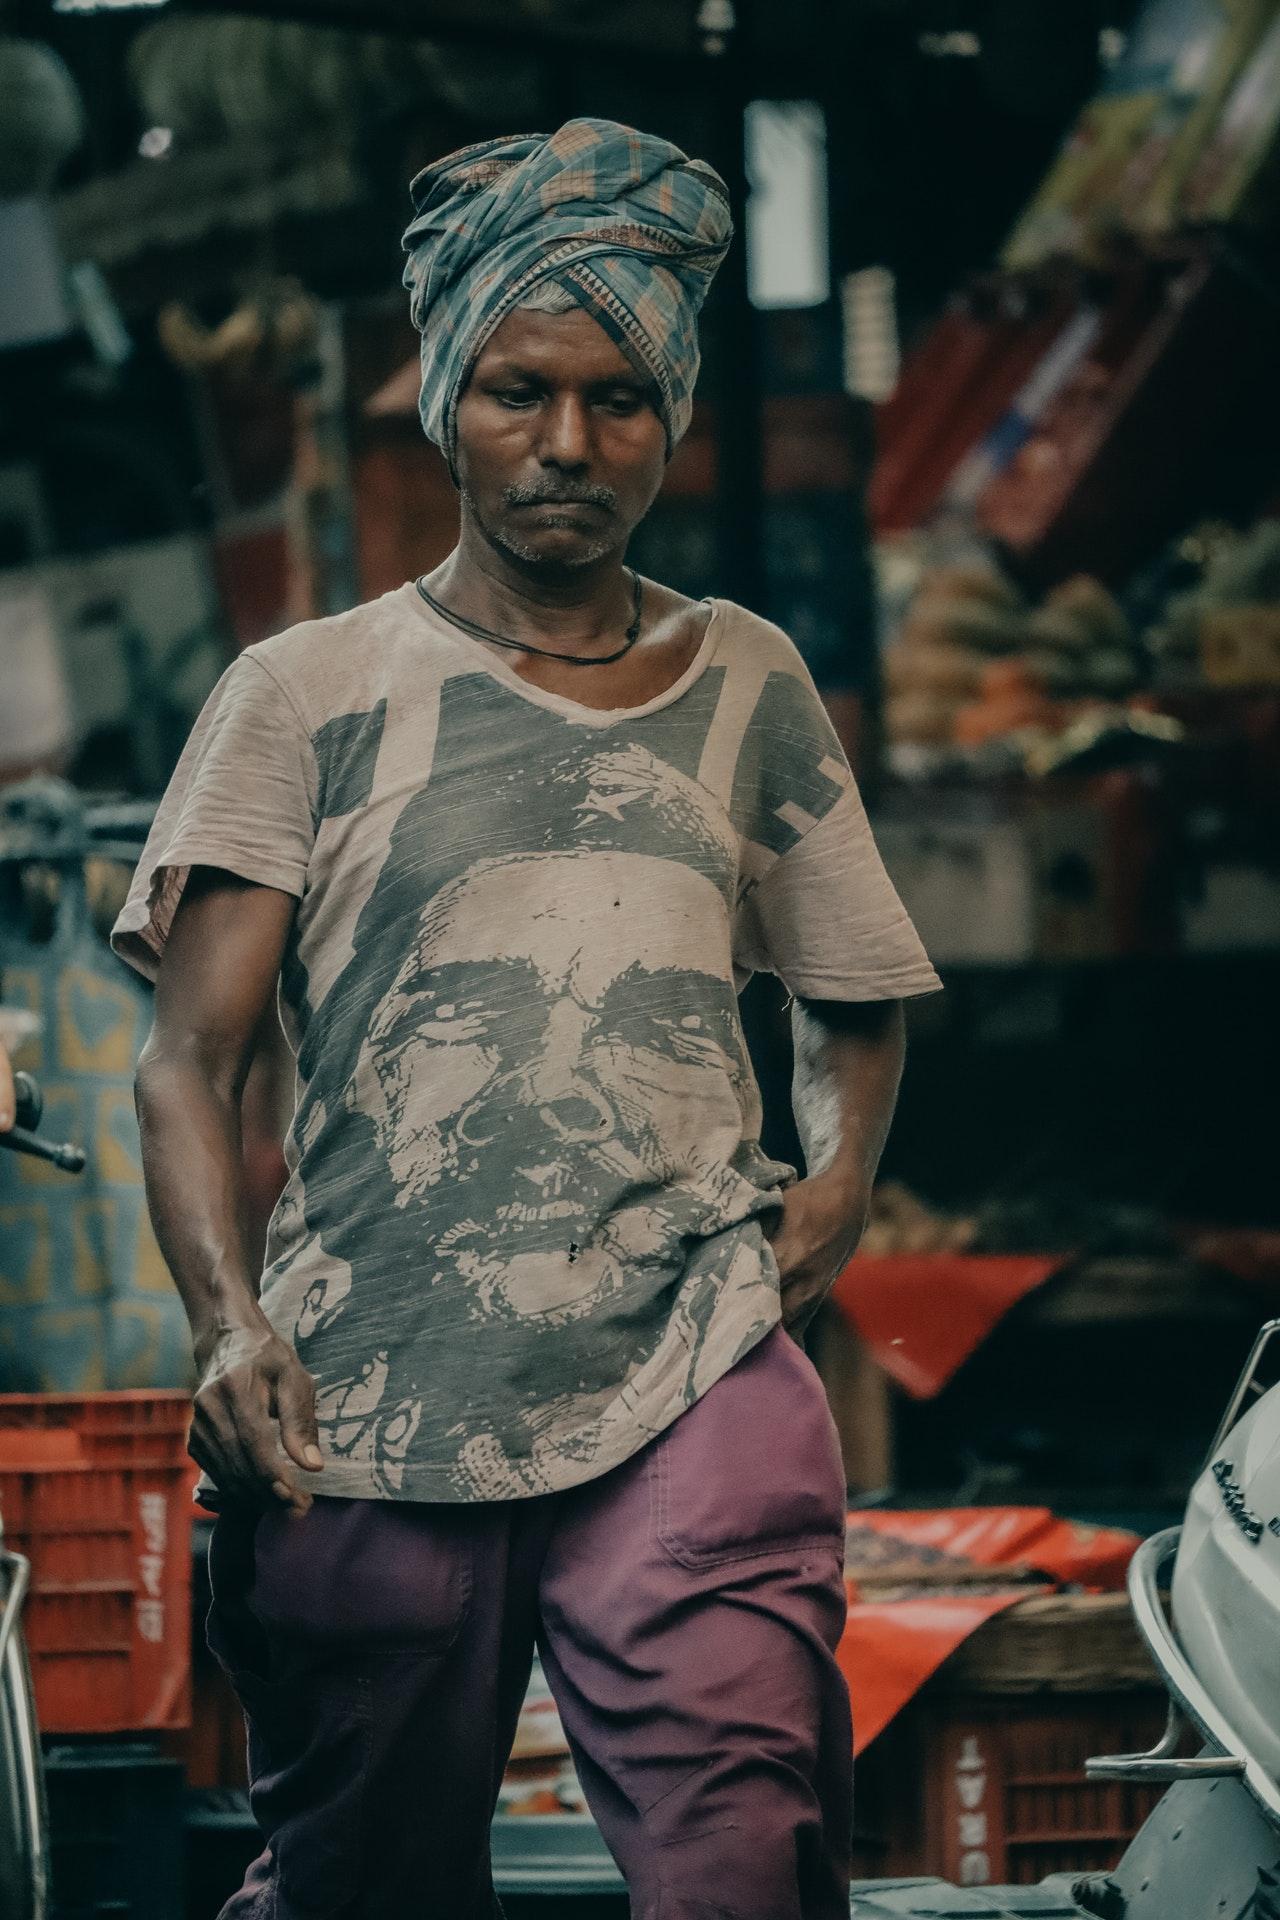 Man walking the streets